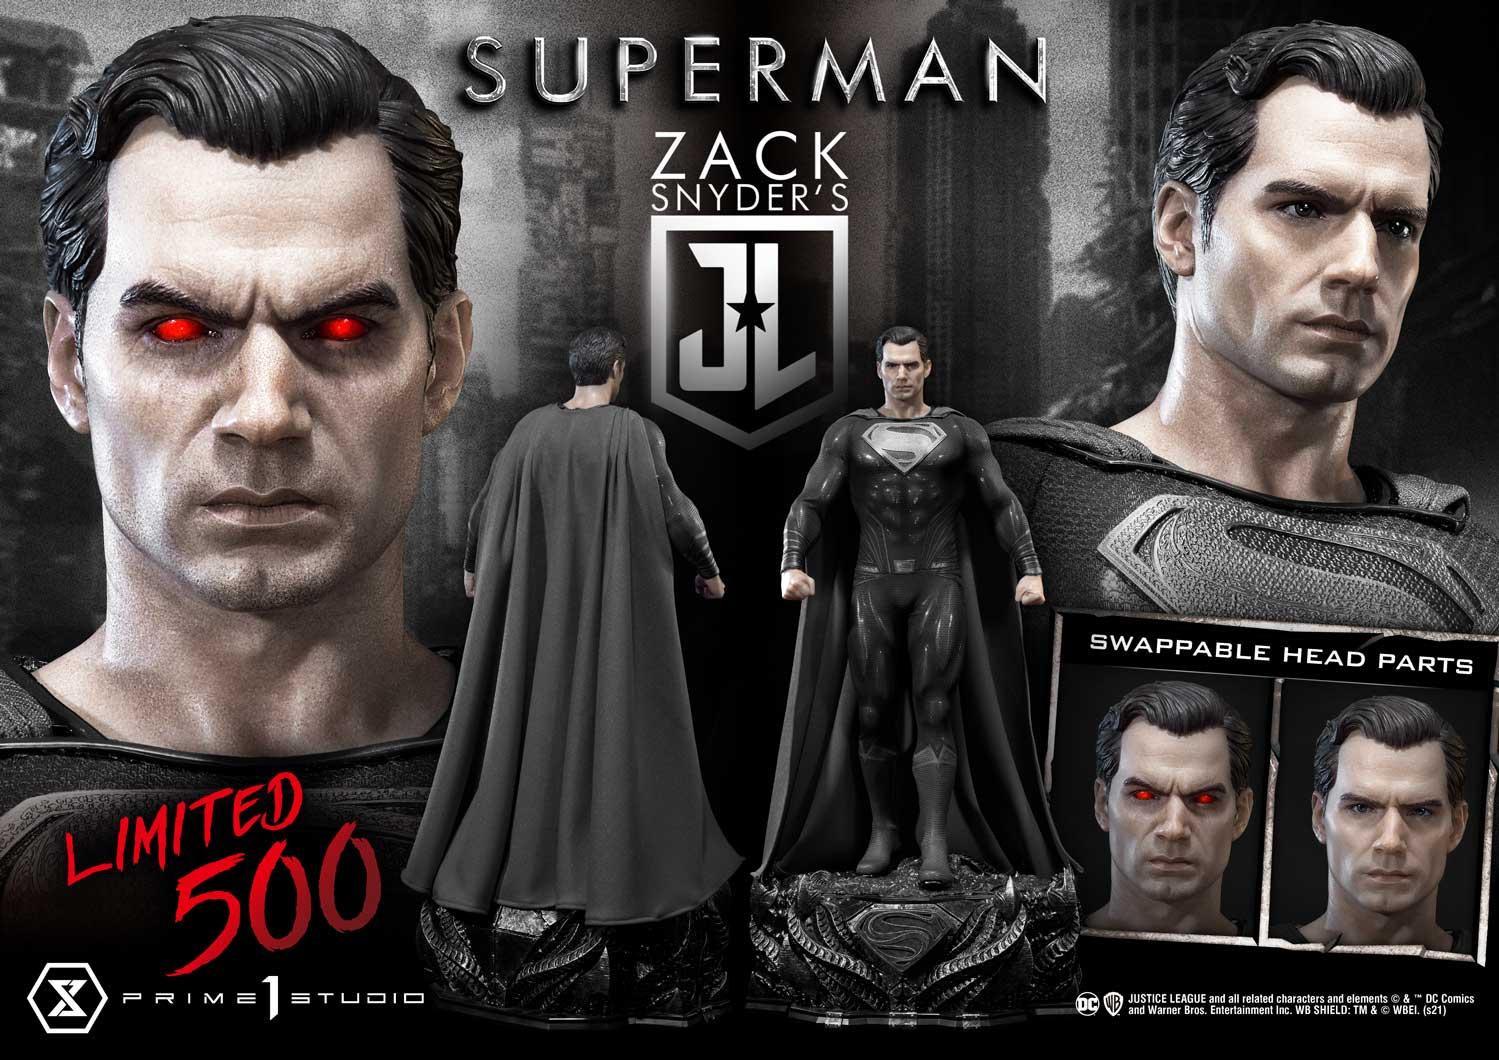 Zack Synder Justice League Superman Black Suit